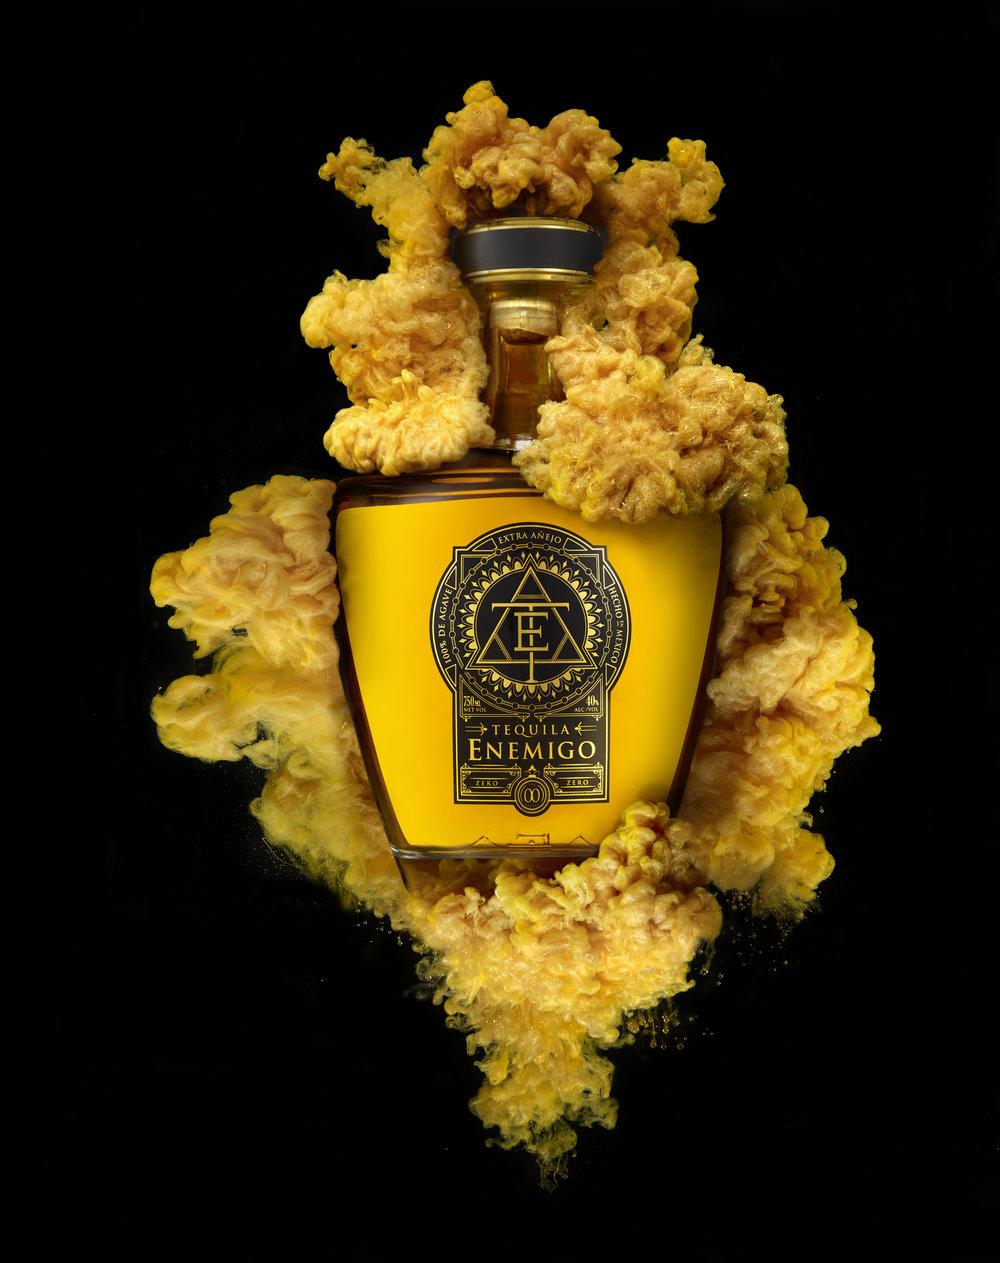 Tequila Enemigo